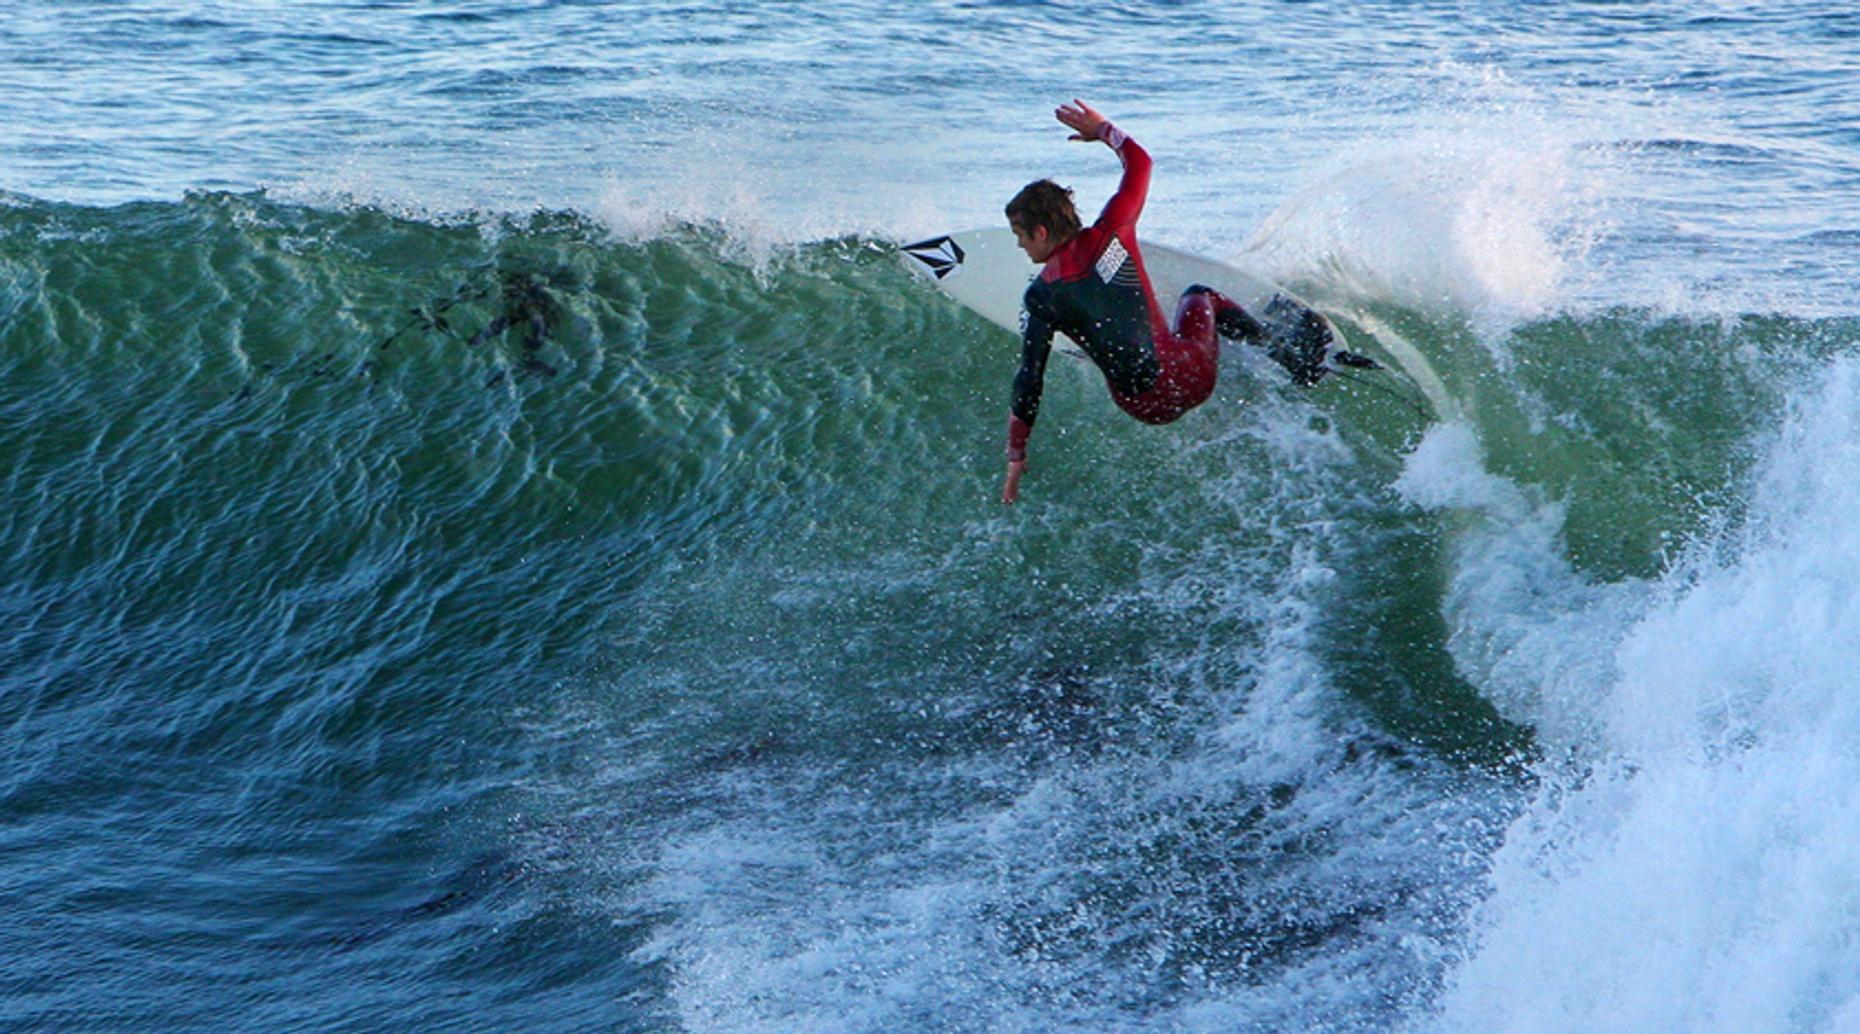 One-Hour Private Surfing Lesson in Santa Cruz